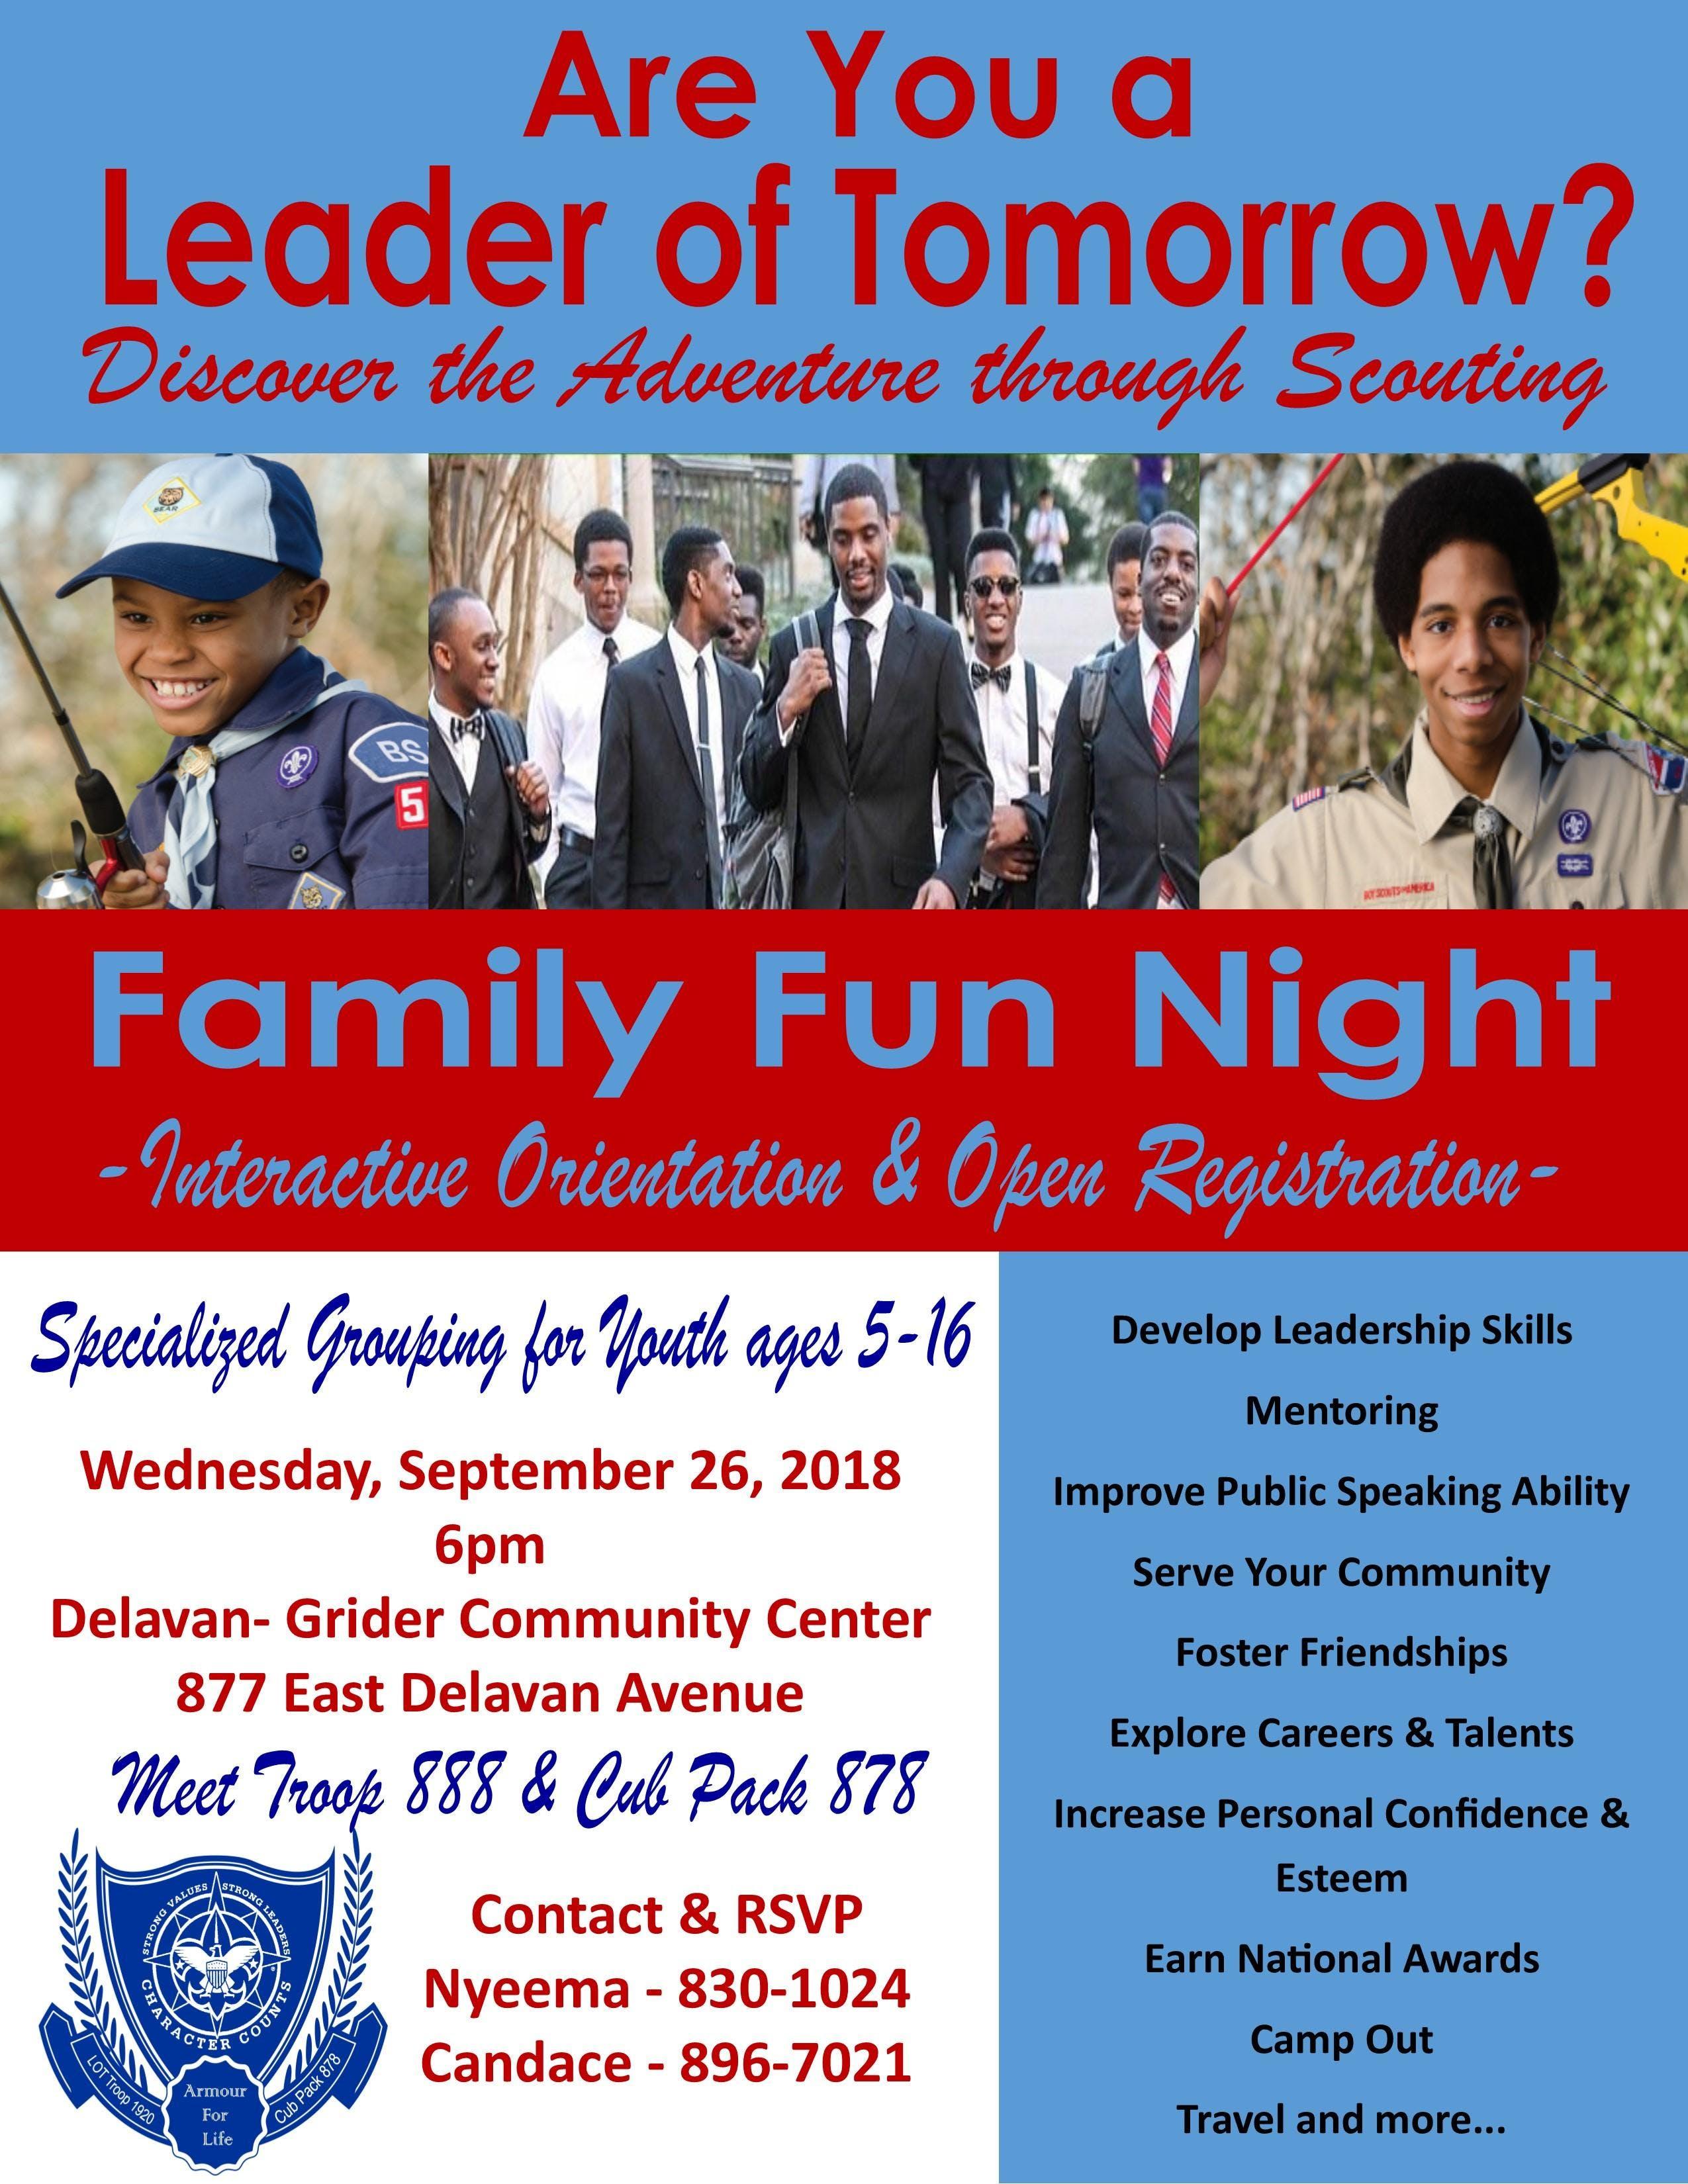 Leaders of Tomorrow Mentoring & Scouting Prog